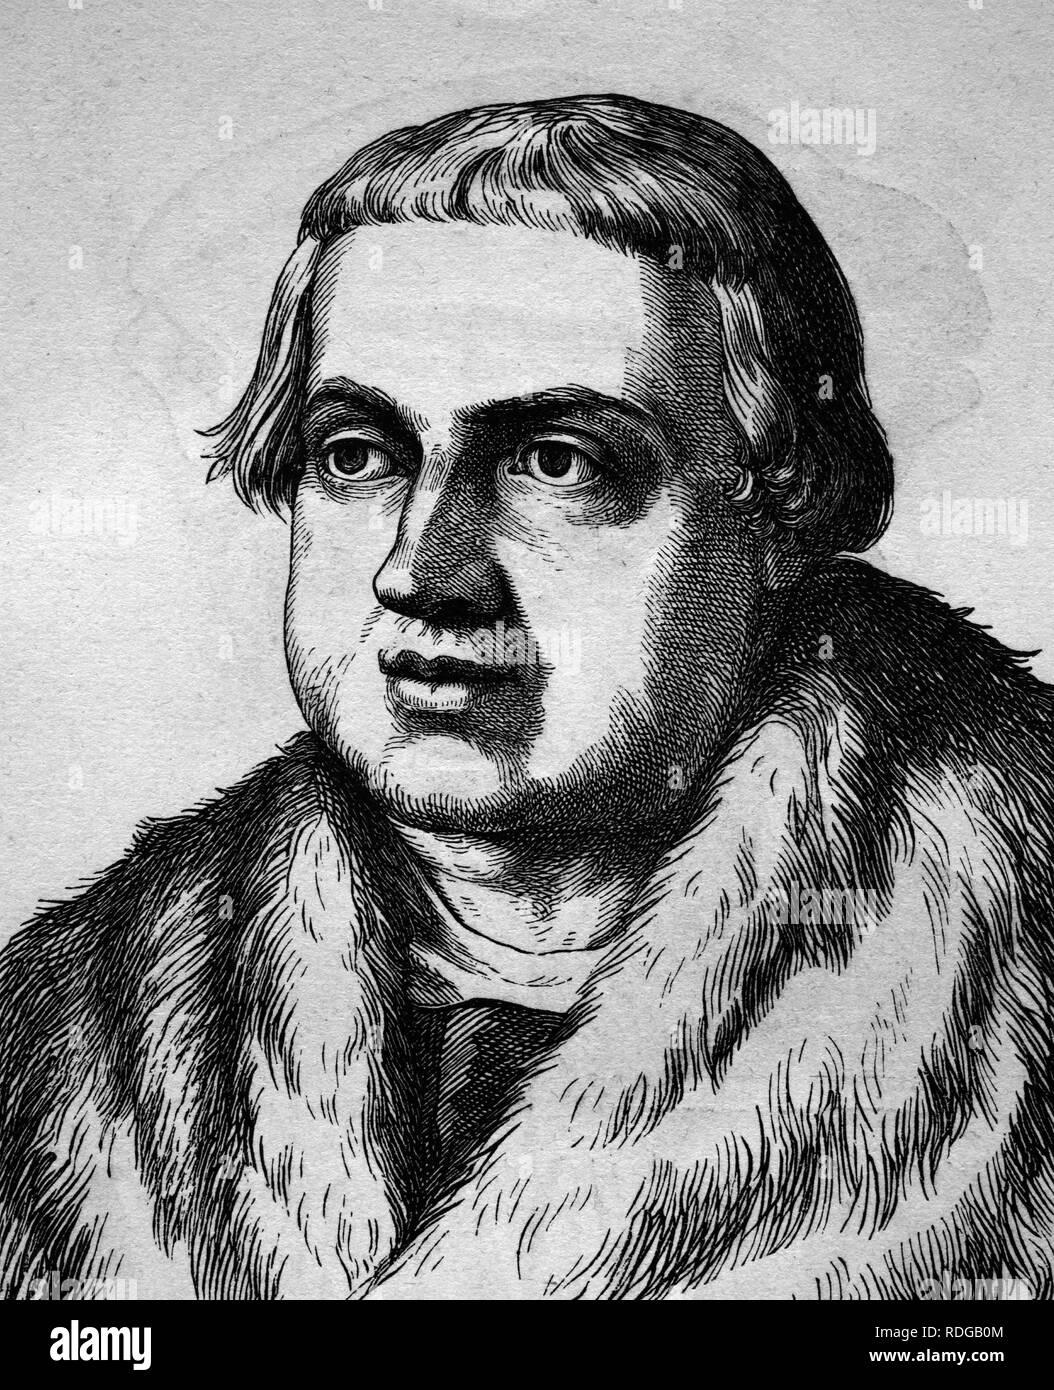 Conrad Peutinger, German lawyer, 1465 - 1547, historical illustration, portrait, 1880 - Stock Image